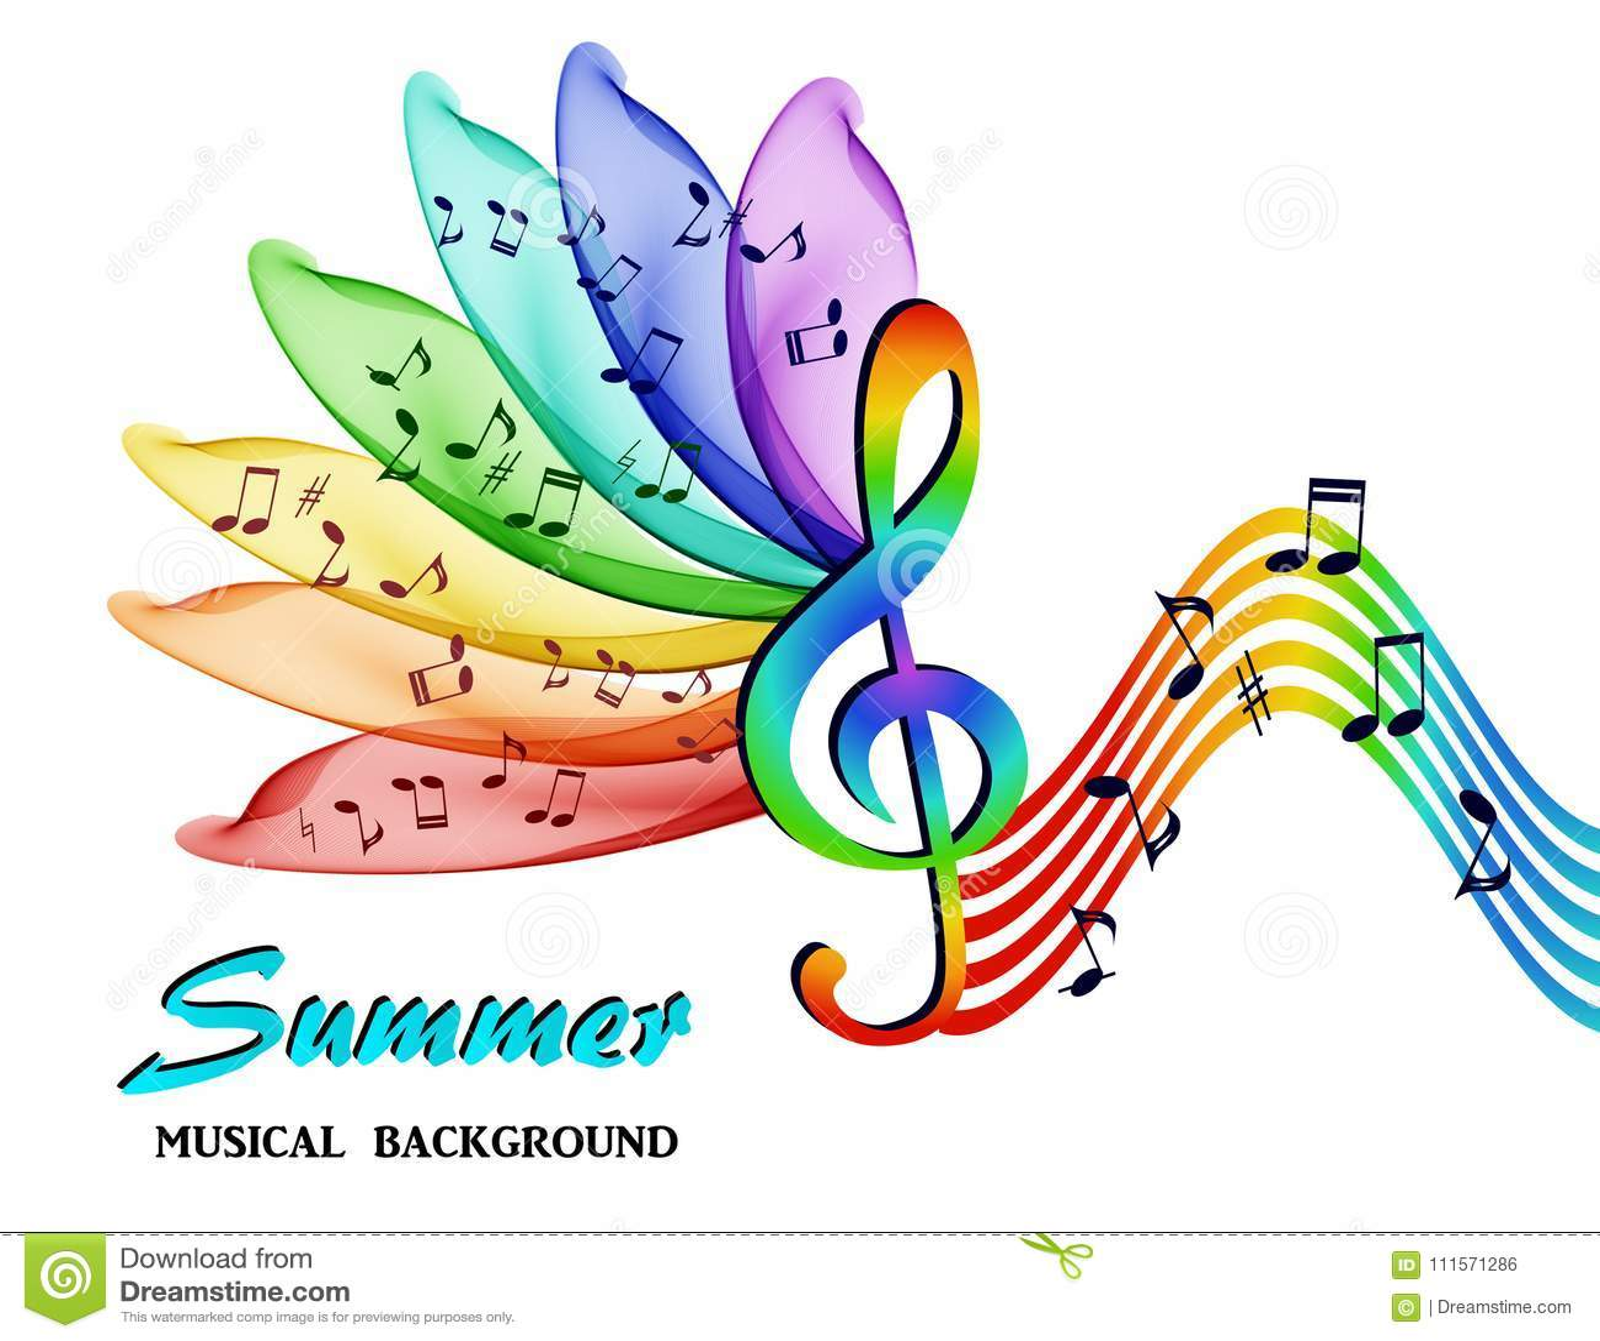 Las notas musicales sobre un fondo de un arco iris abstracto florecen